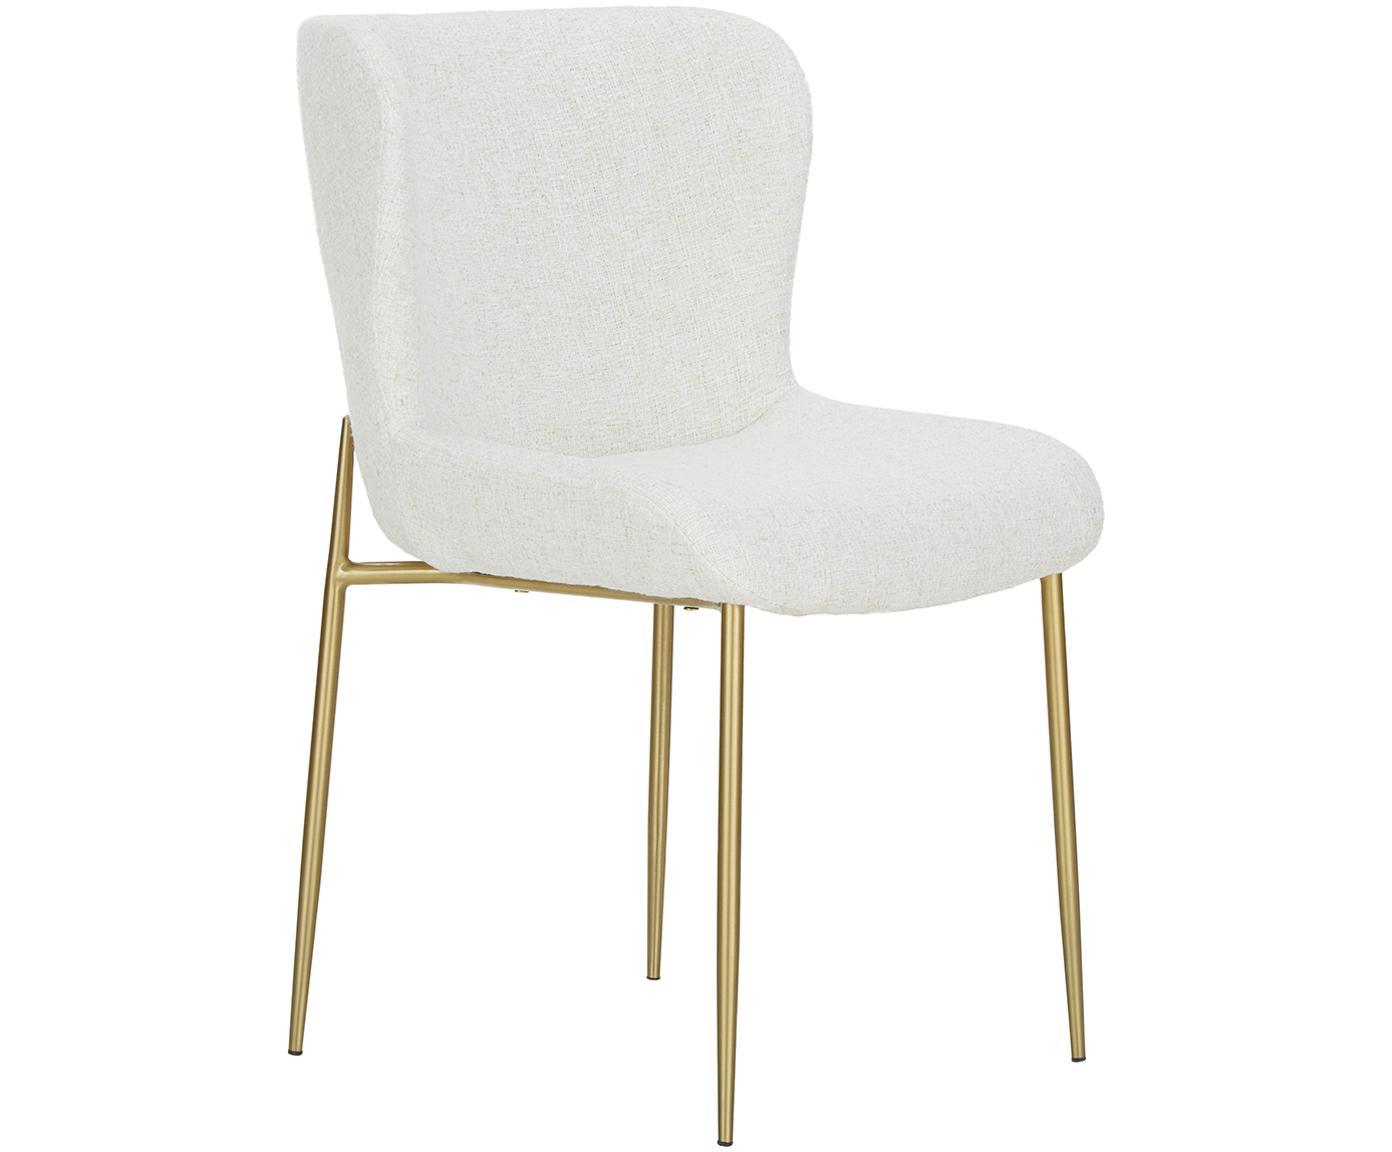 Bouclé stoel Tess, Bekleding: 70% polyester, 20% viscos, Poten: gecoat metaal, Bouclé crèmewit, poten goudkleurig, B 48 x D 64 cm